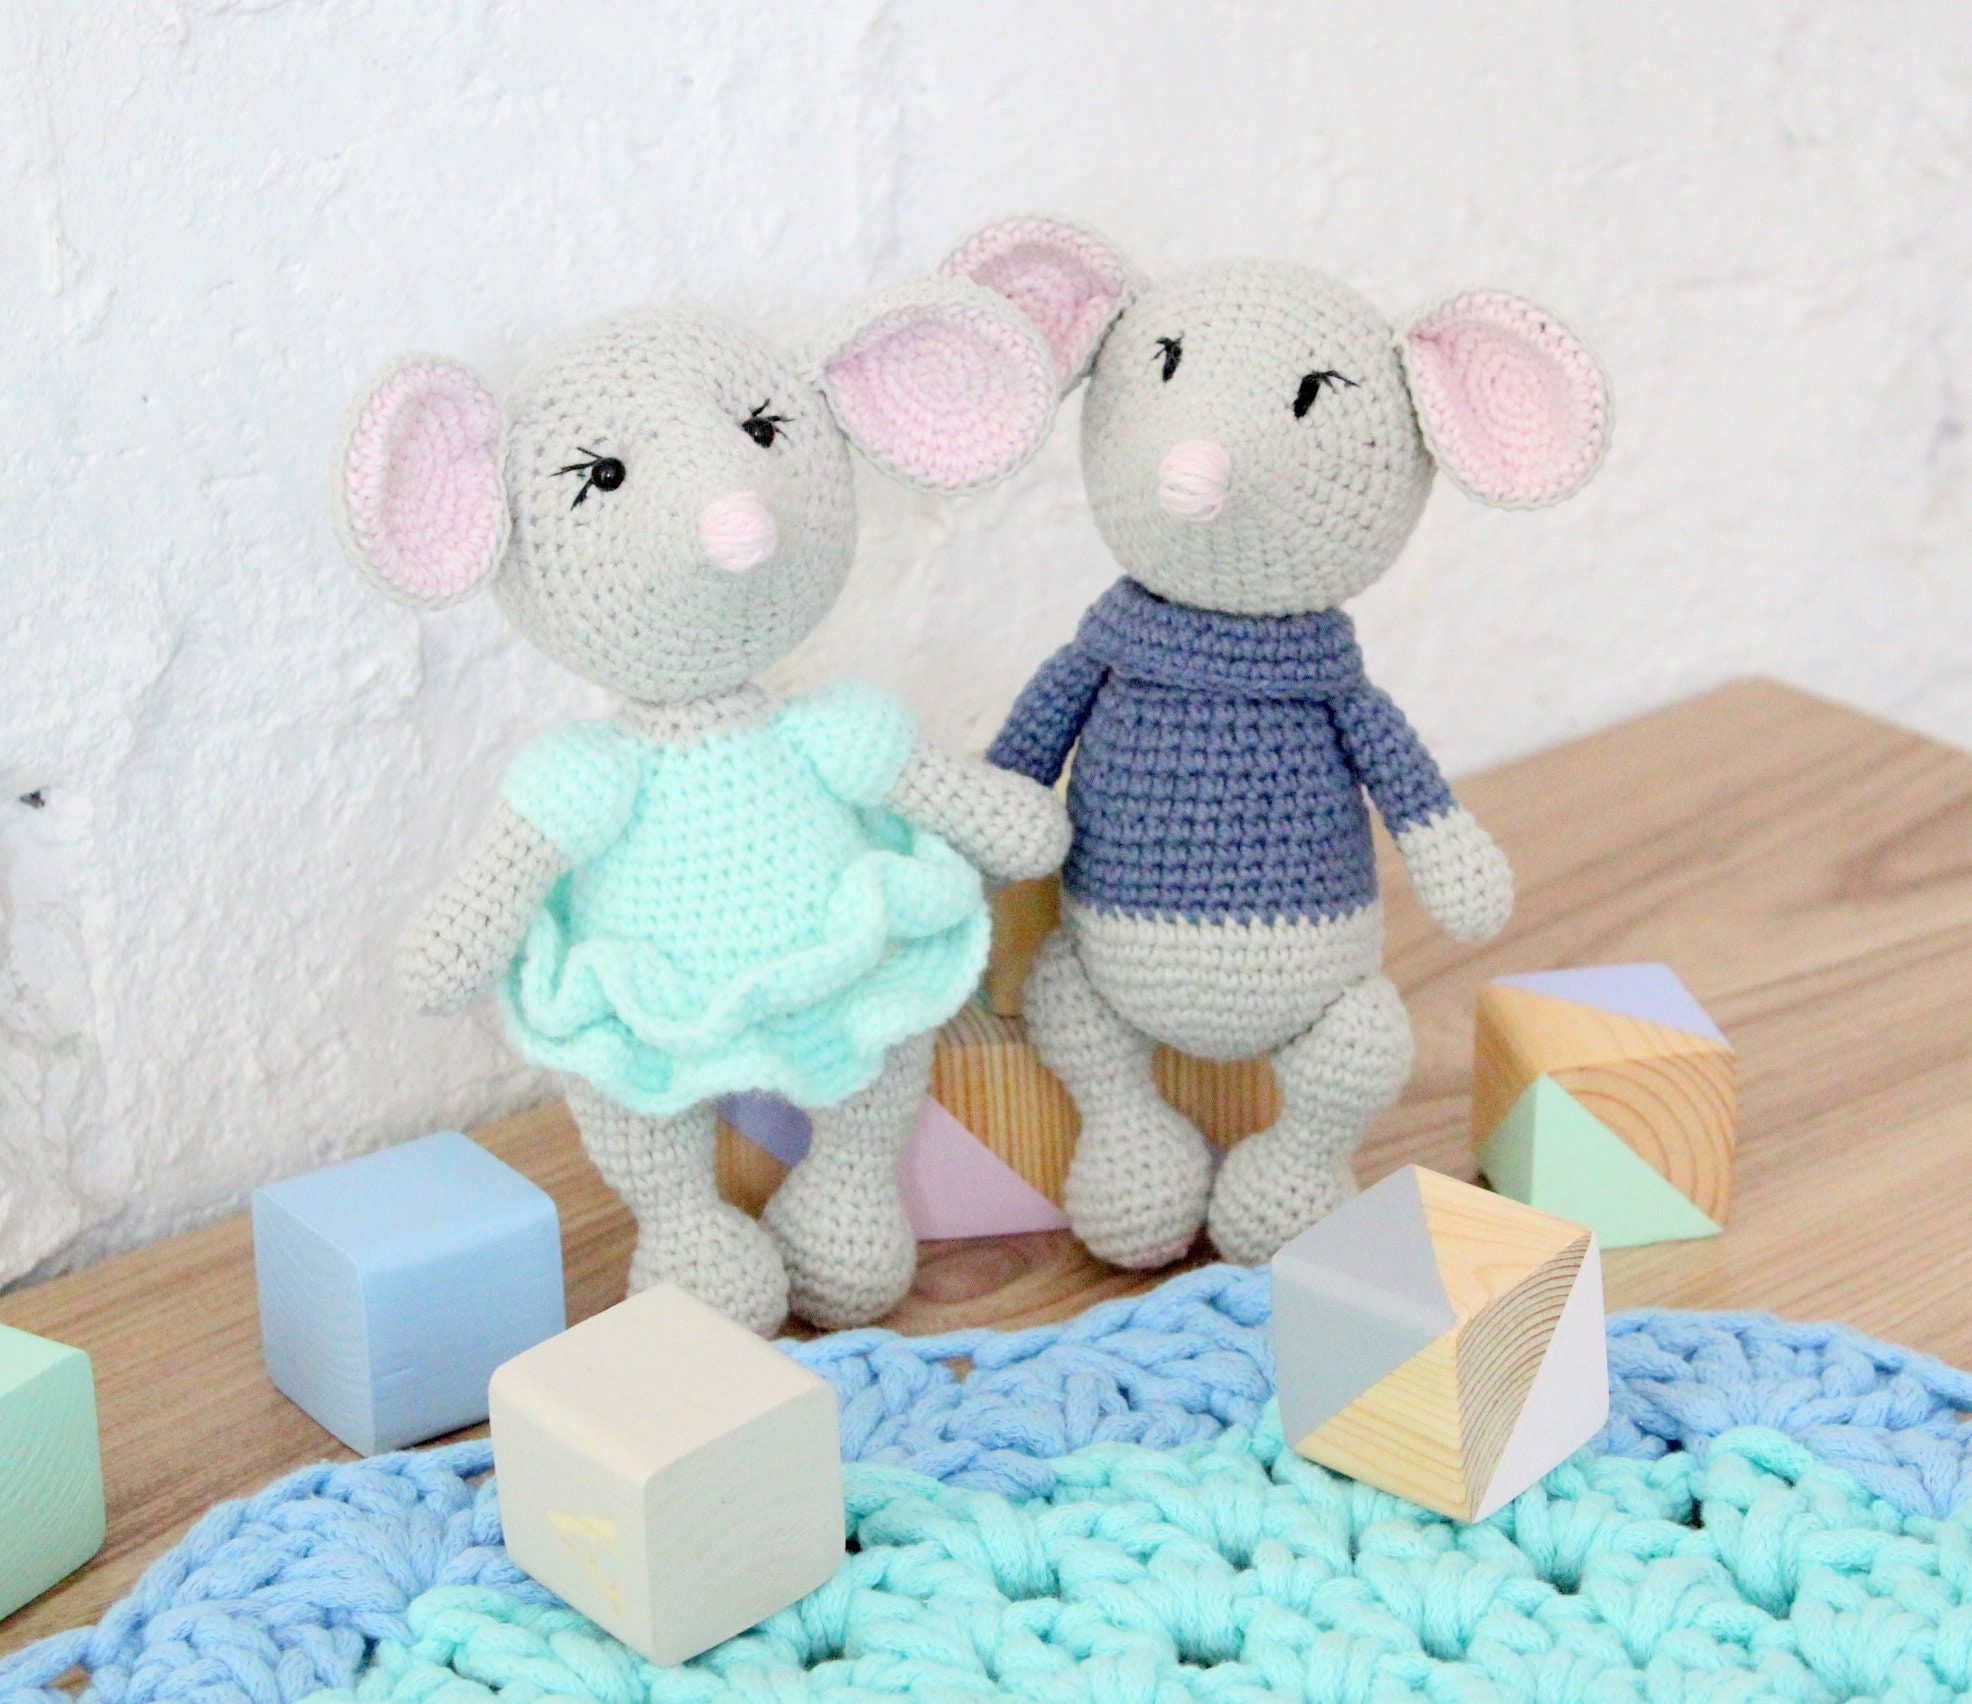 Amigurumi Mouse Crochet Pattern | Supergurumi | 1704x1972